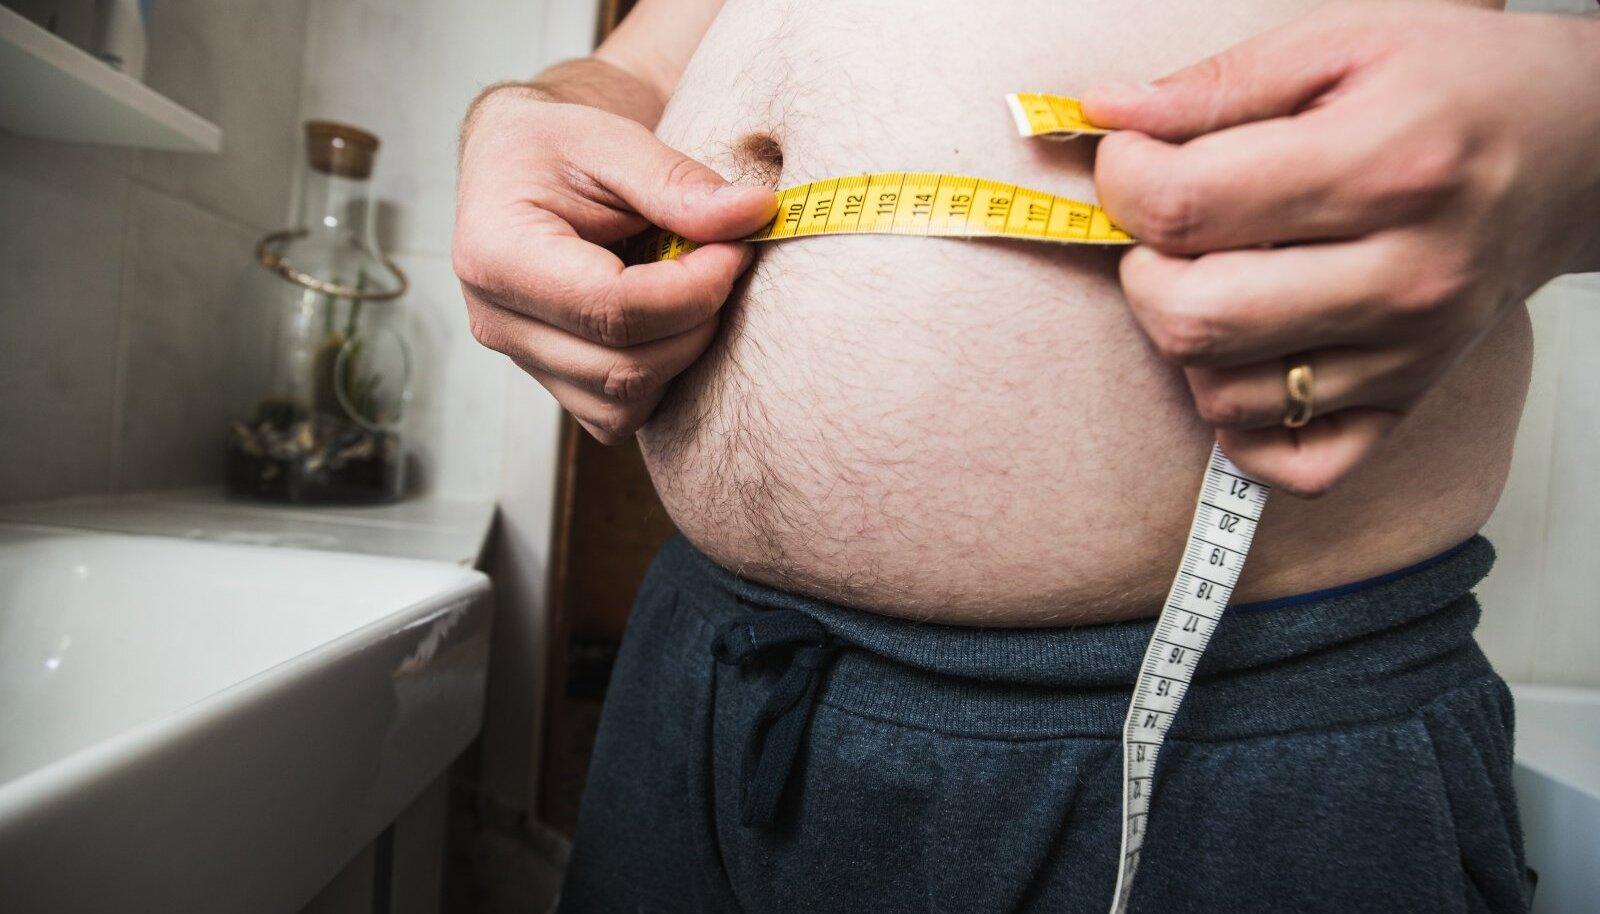 poletage rasva lahja mass